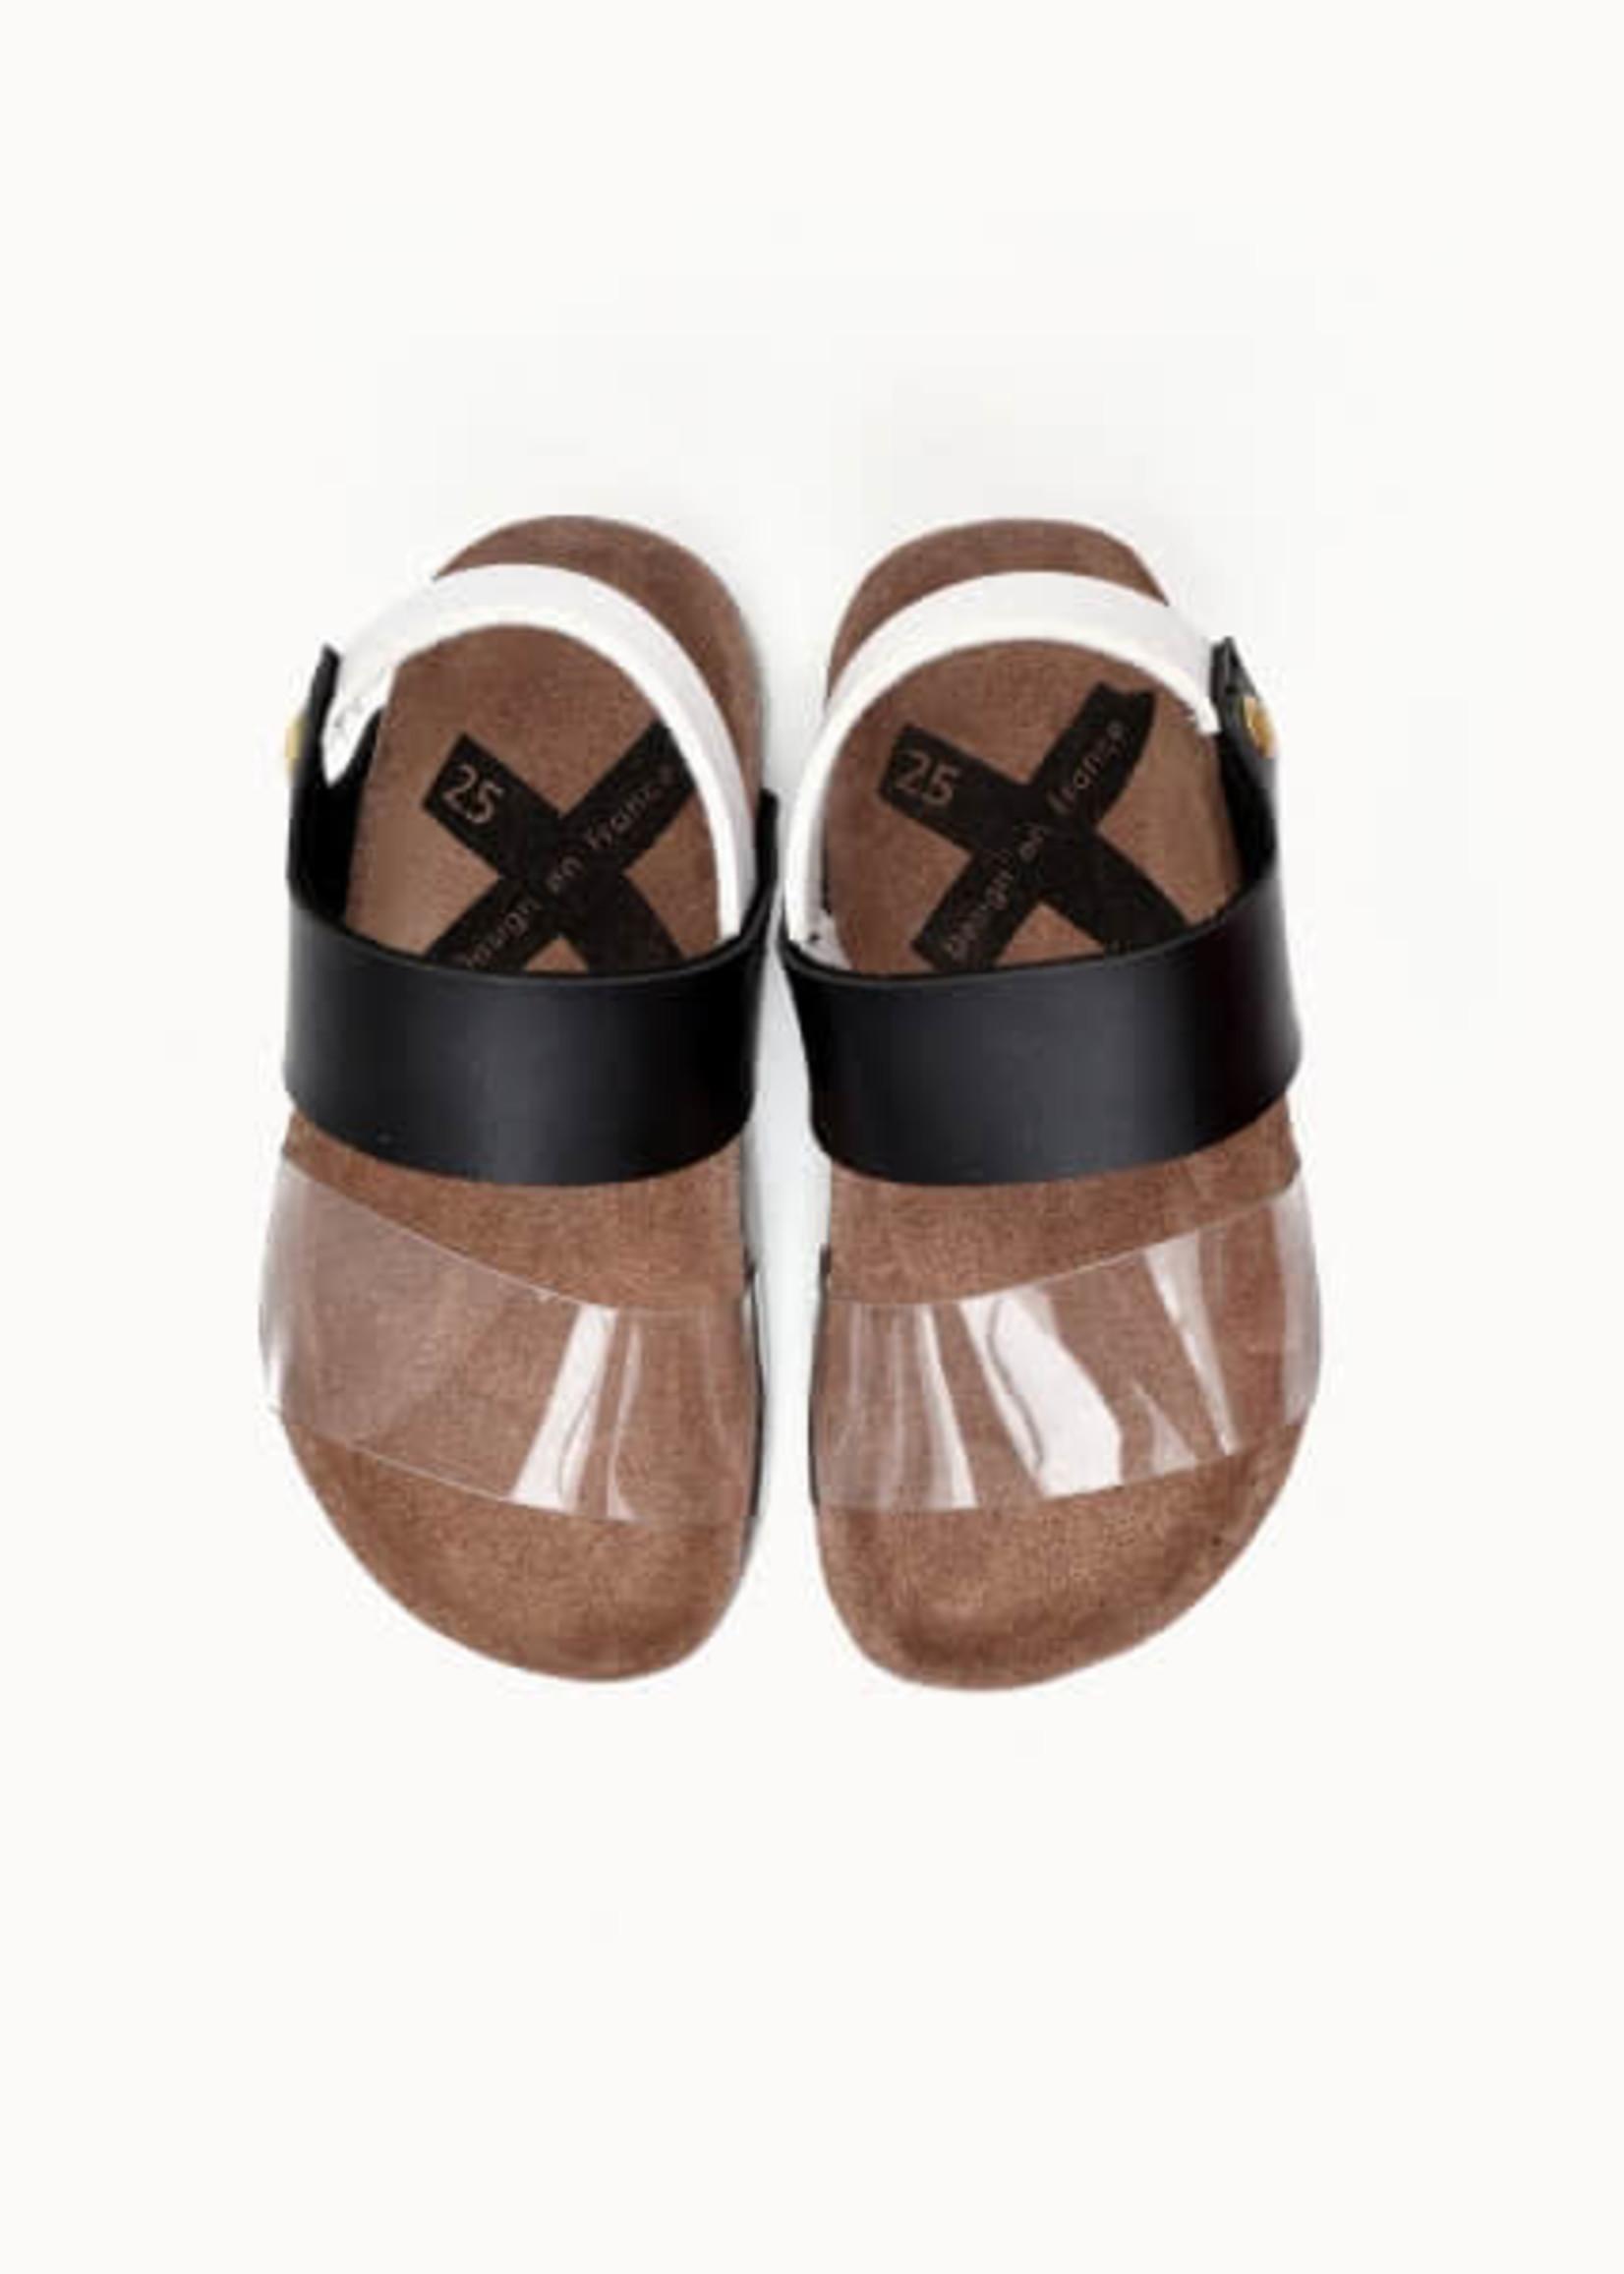 "Boxbo Boxbo-ss21 Futurit"" minimalist cork sandals Référence : SD1905"